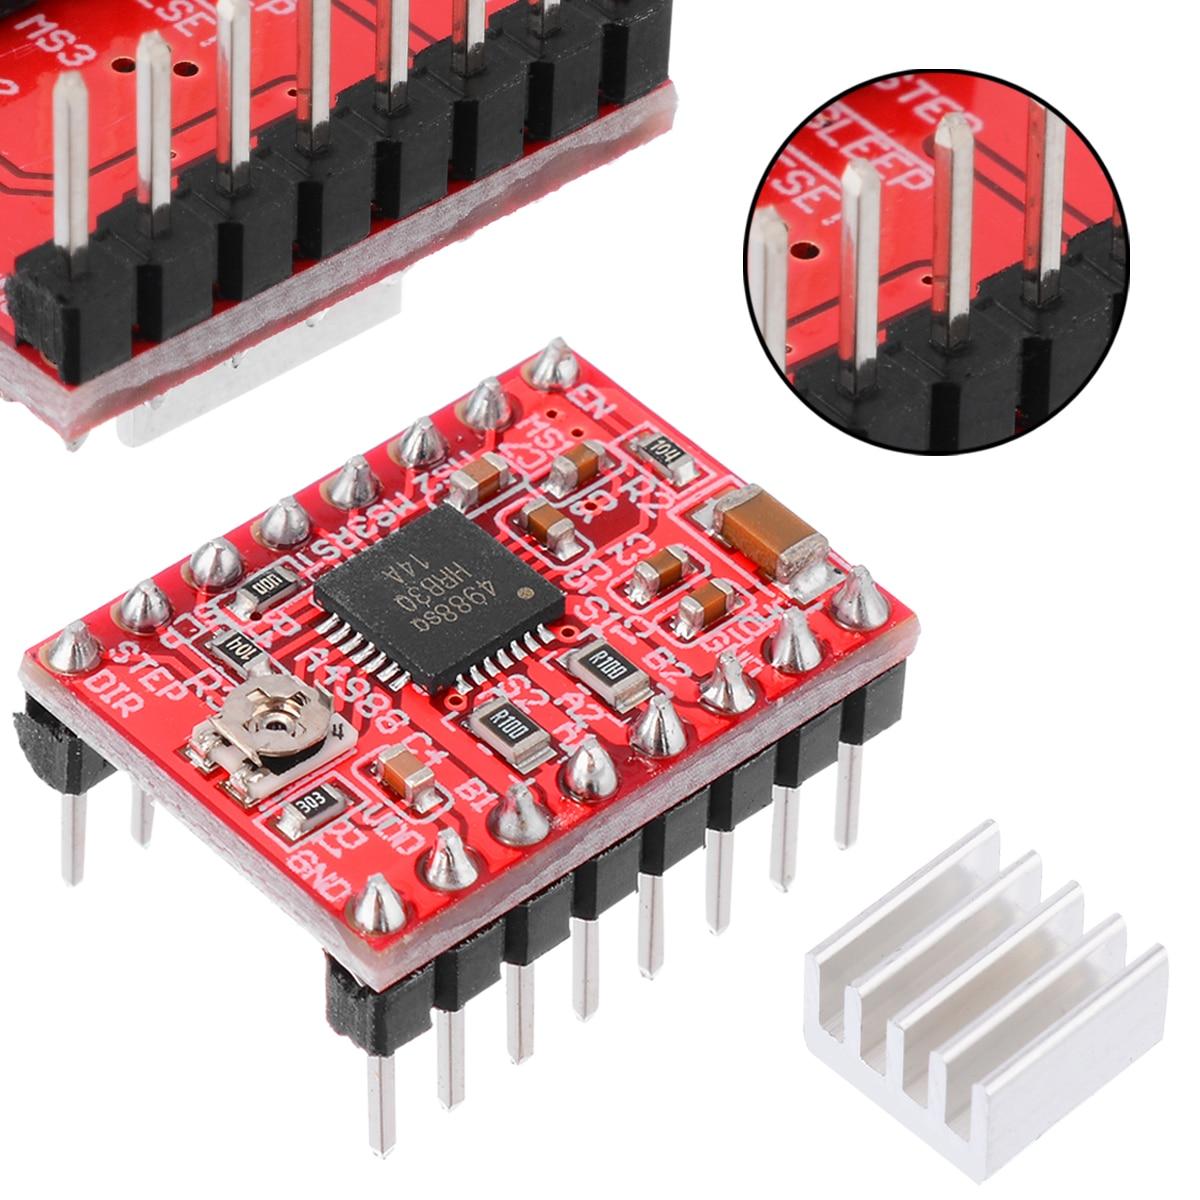 A4988 Stepper Motor Driver Module 3D Printer Polulu StepStick RAMPS RepRap